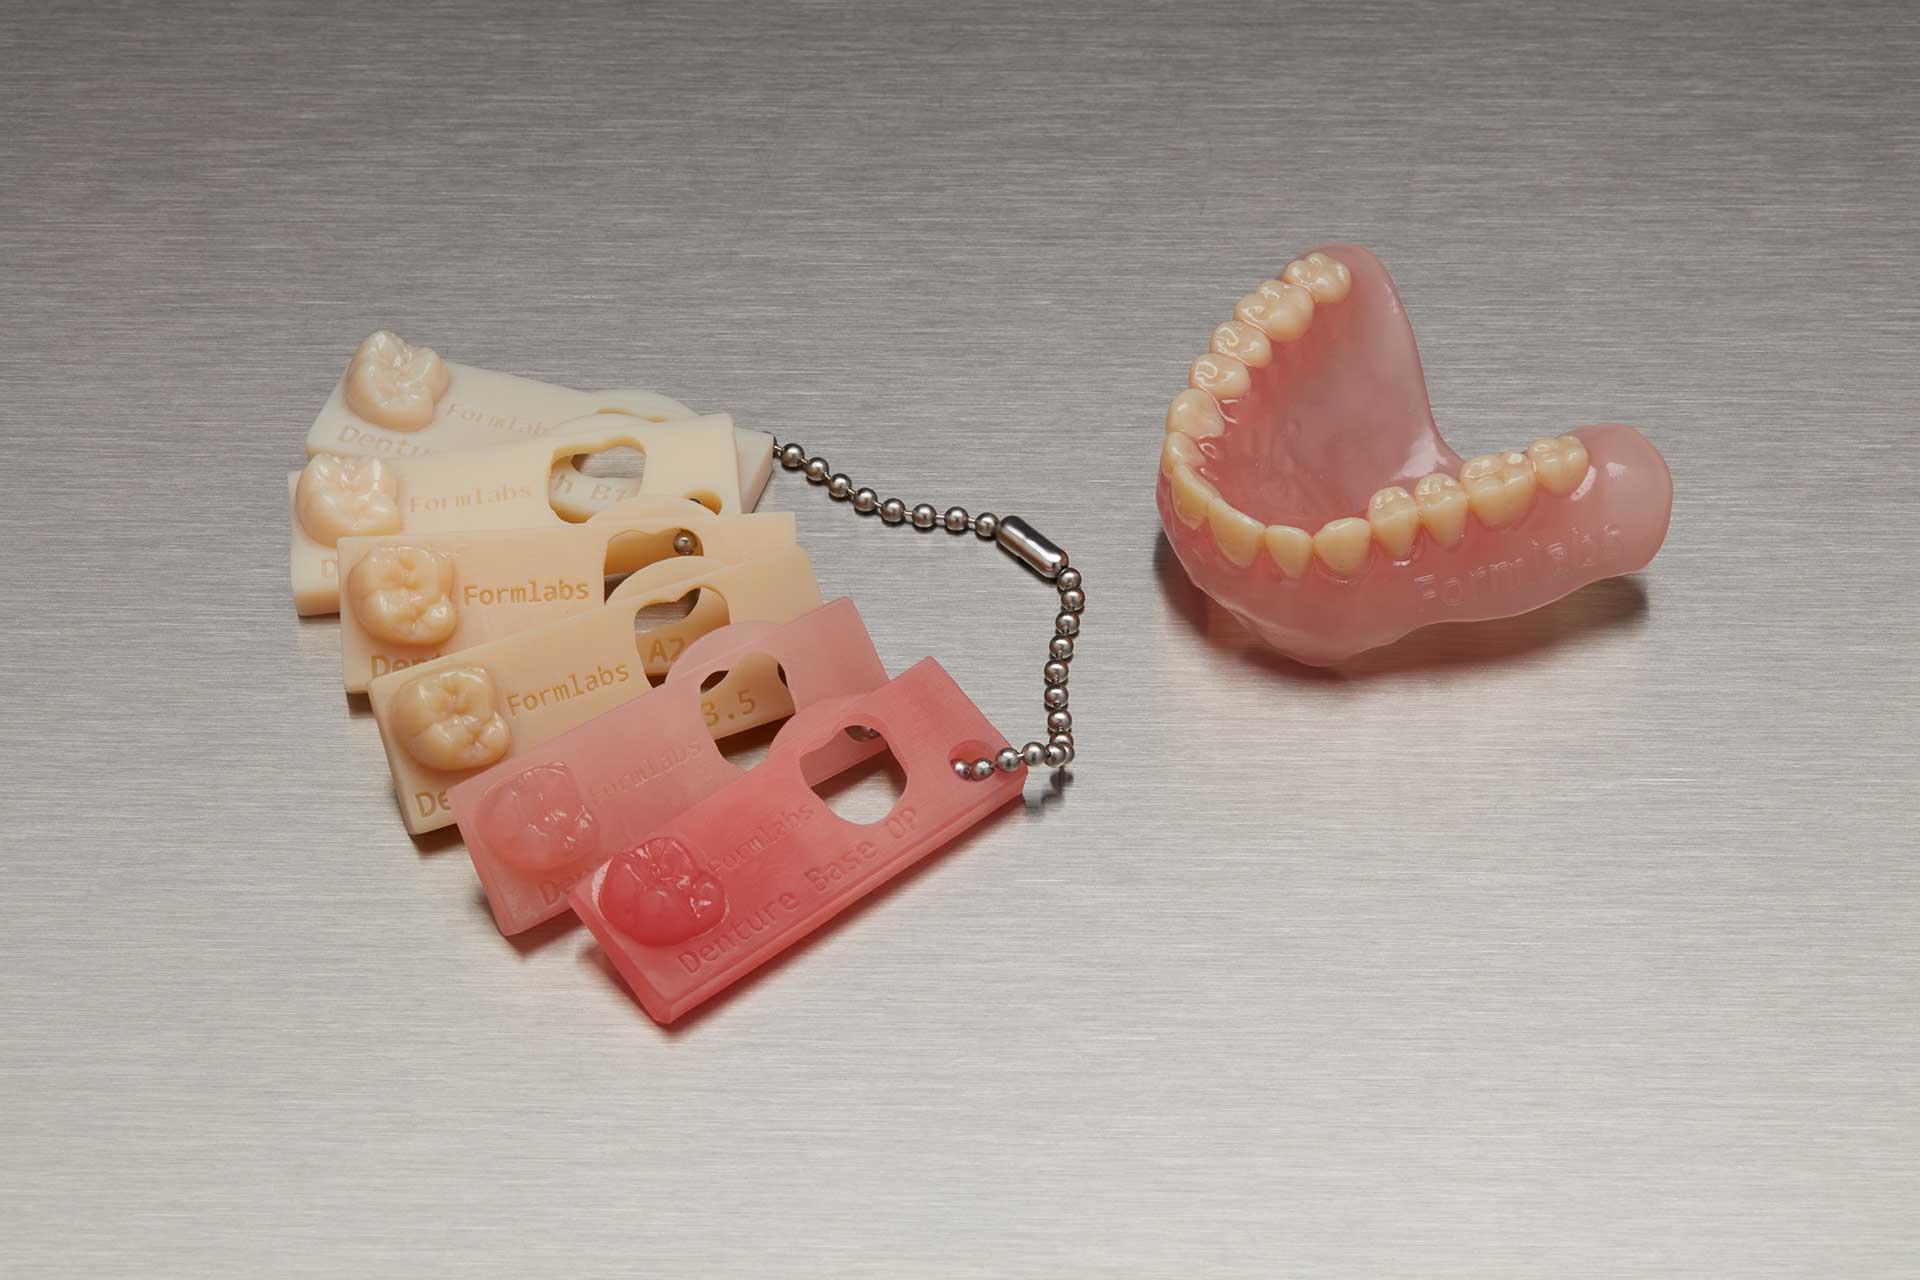 digital-denture-wydruk